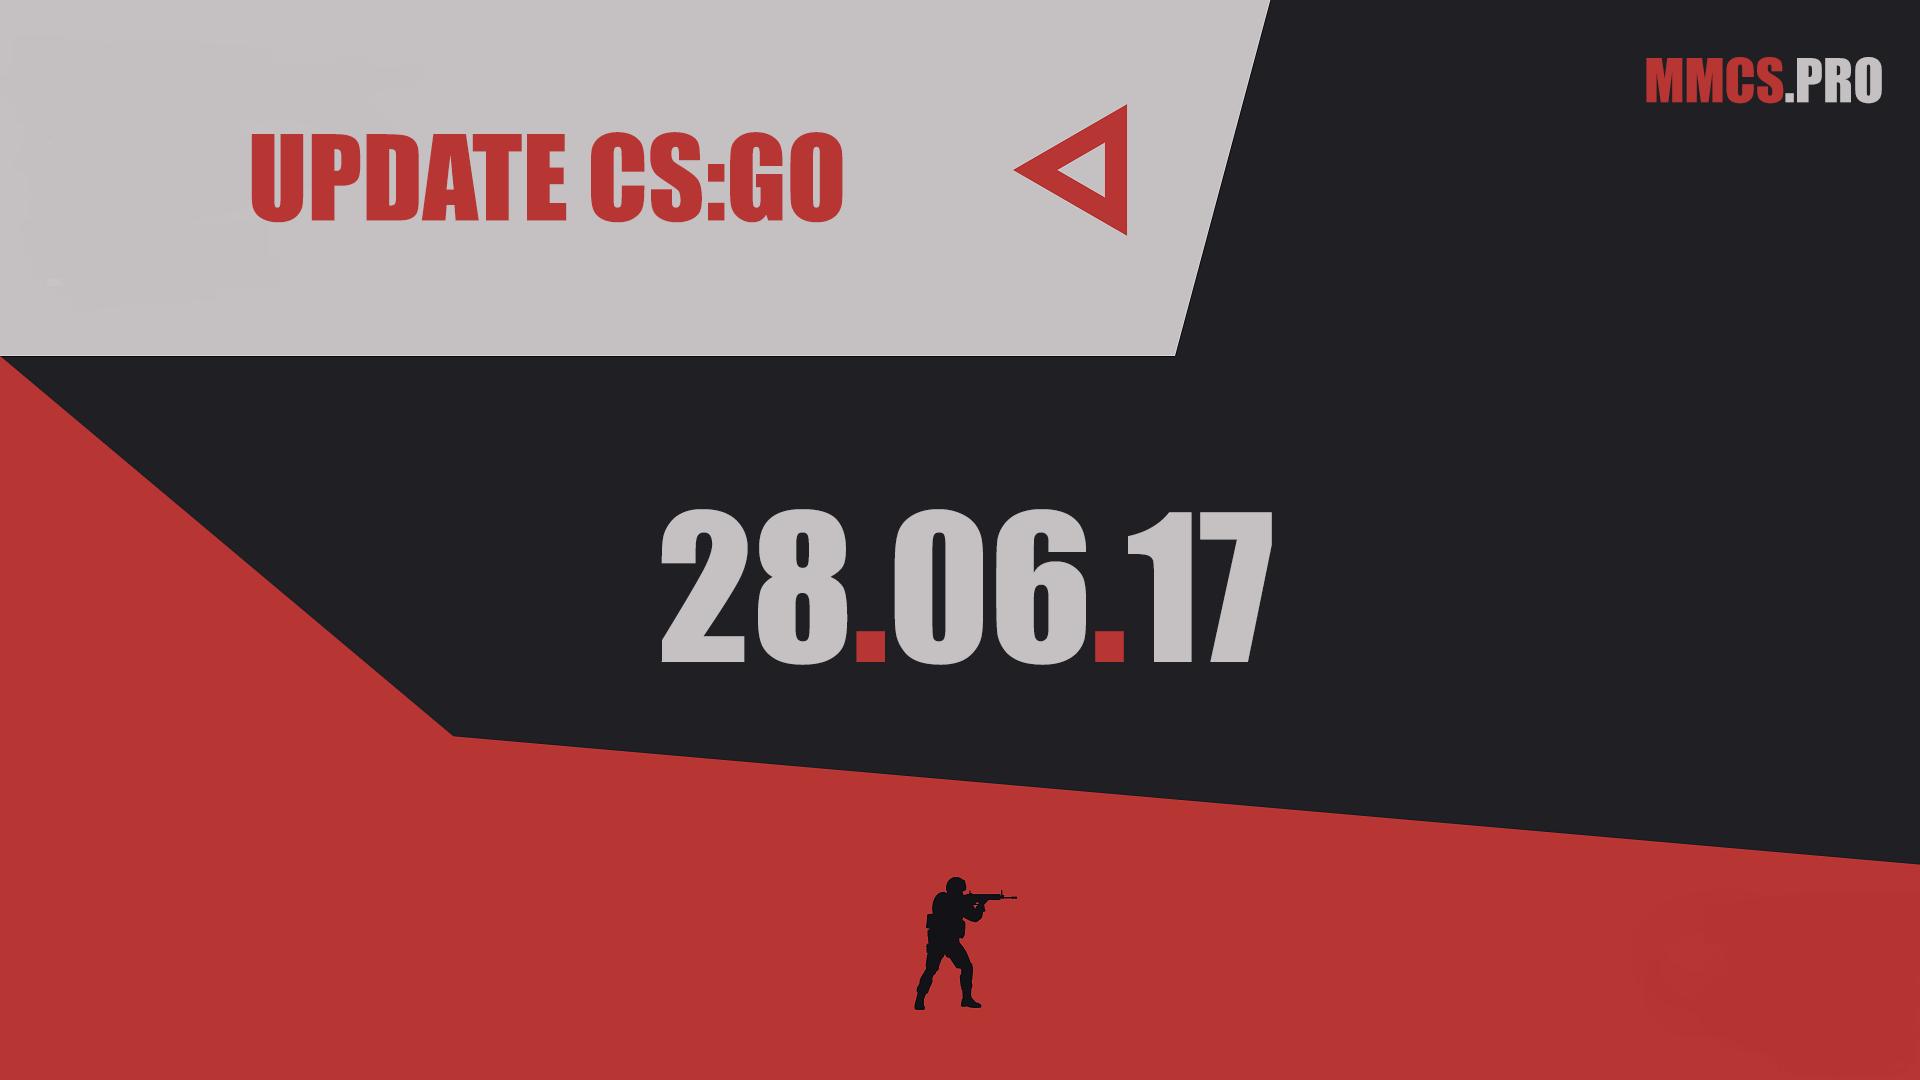 https://mmcs.pro/update-csgo-28-06-2017-valve/